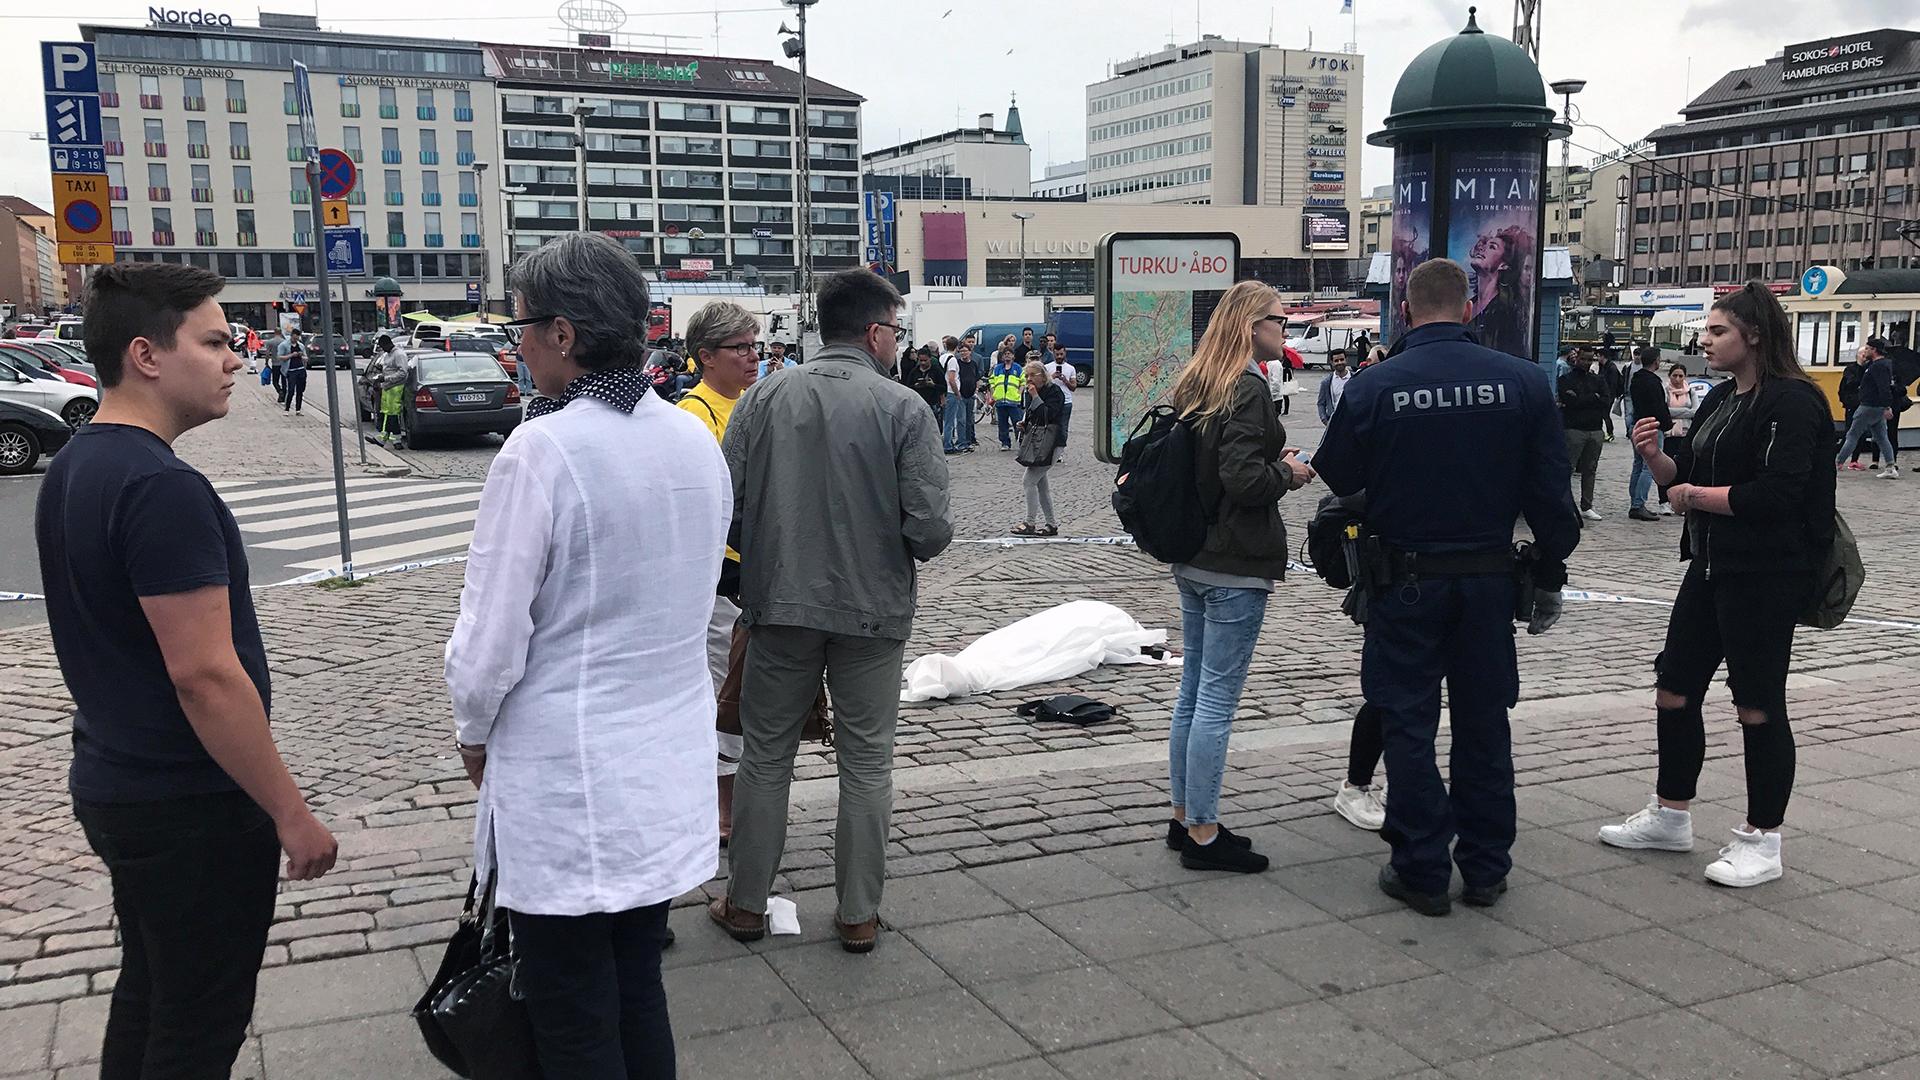 Finland Stabbing scene 1-159532.jpg93855019